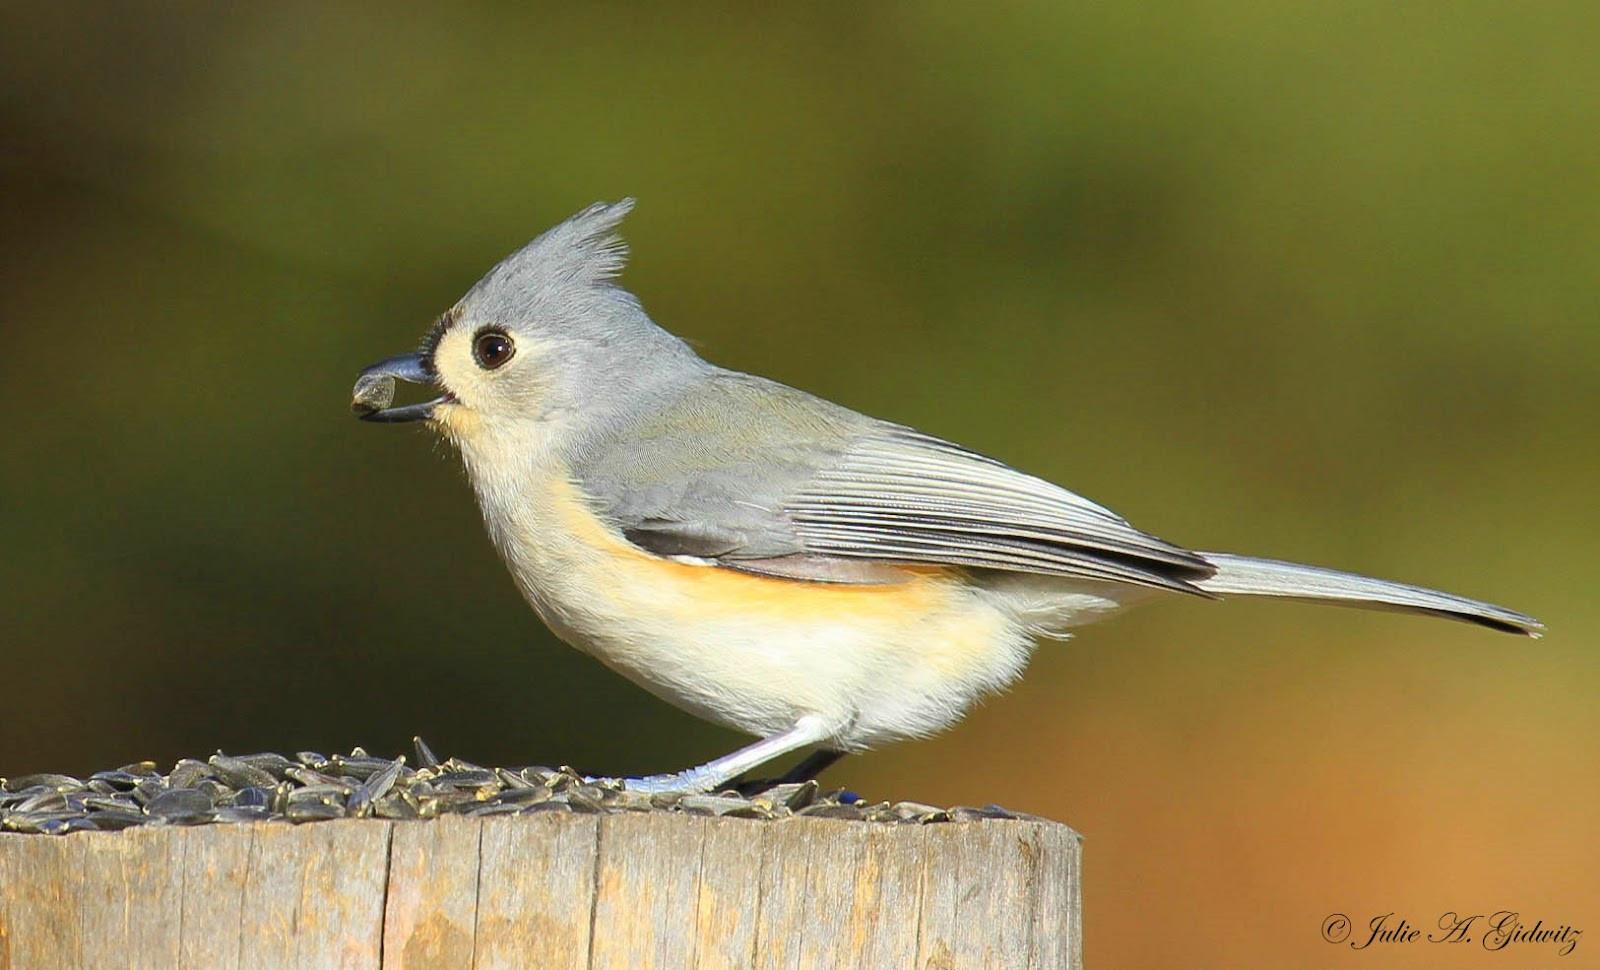 Best ideas about Florida Backyard Birds . Save or Pin Nature s Splendor Backyard Birds Now.